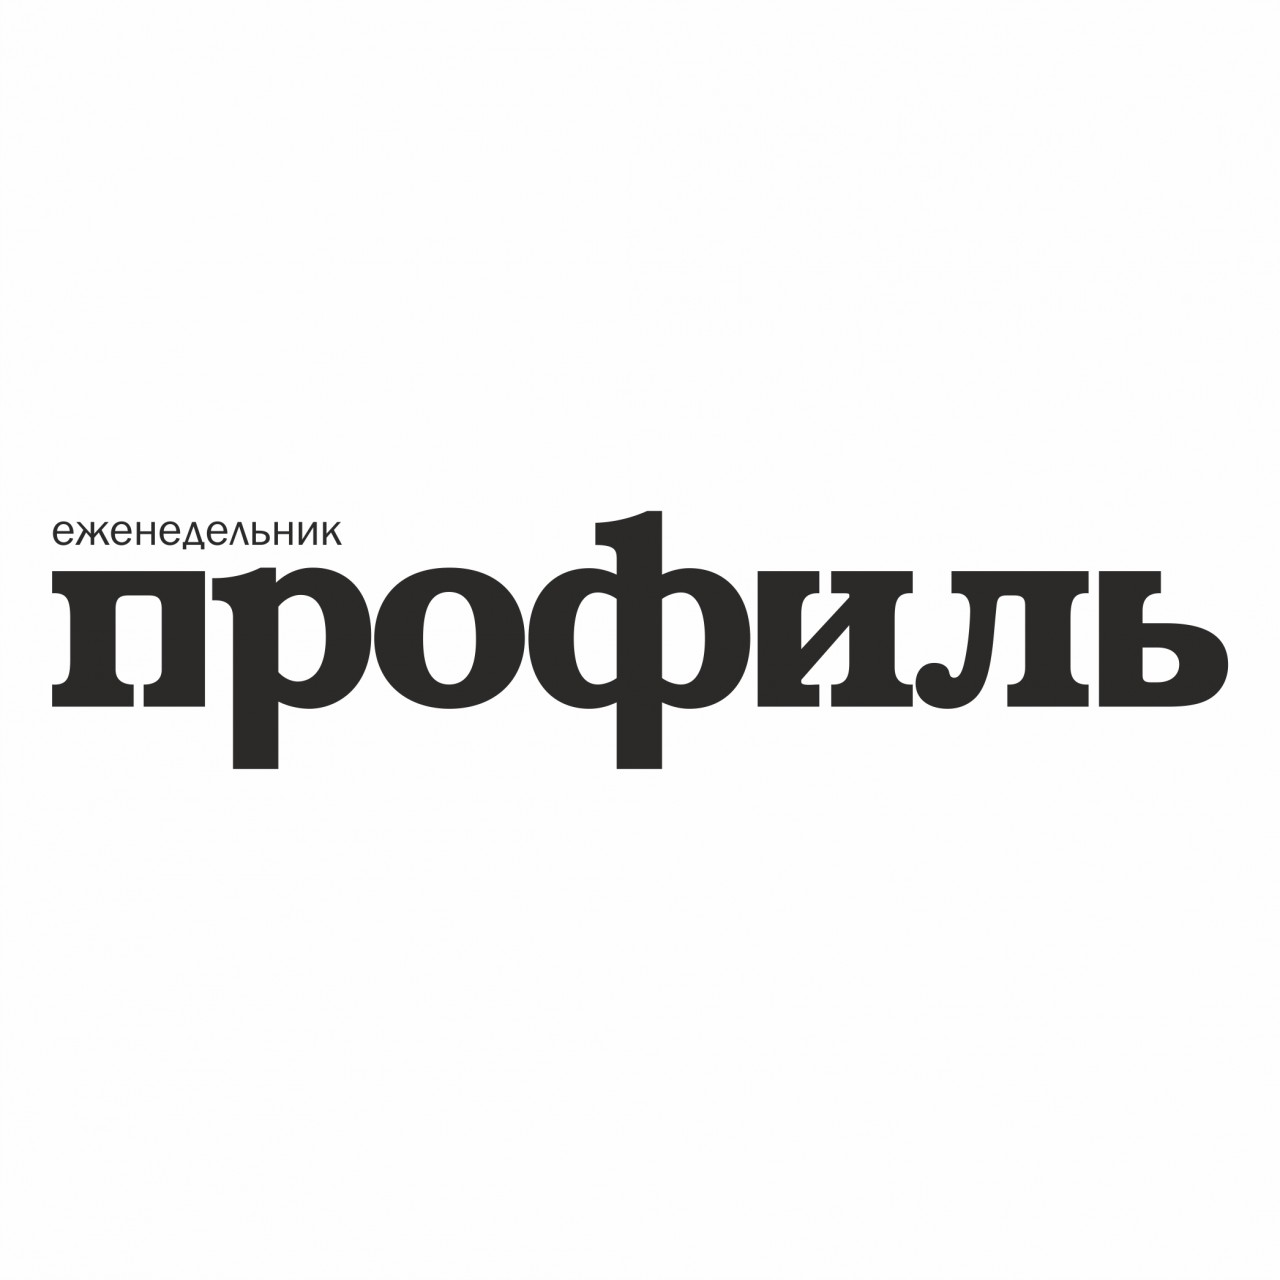 Путин назначил своим советником зятя Ельцина